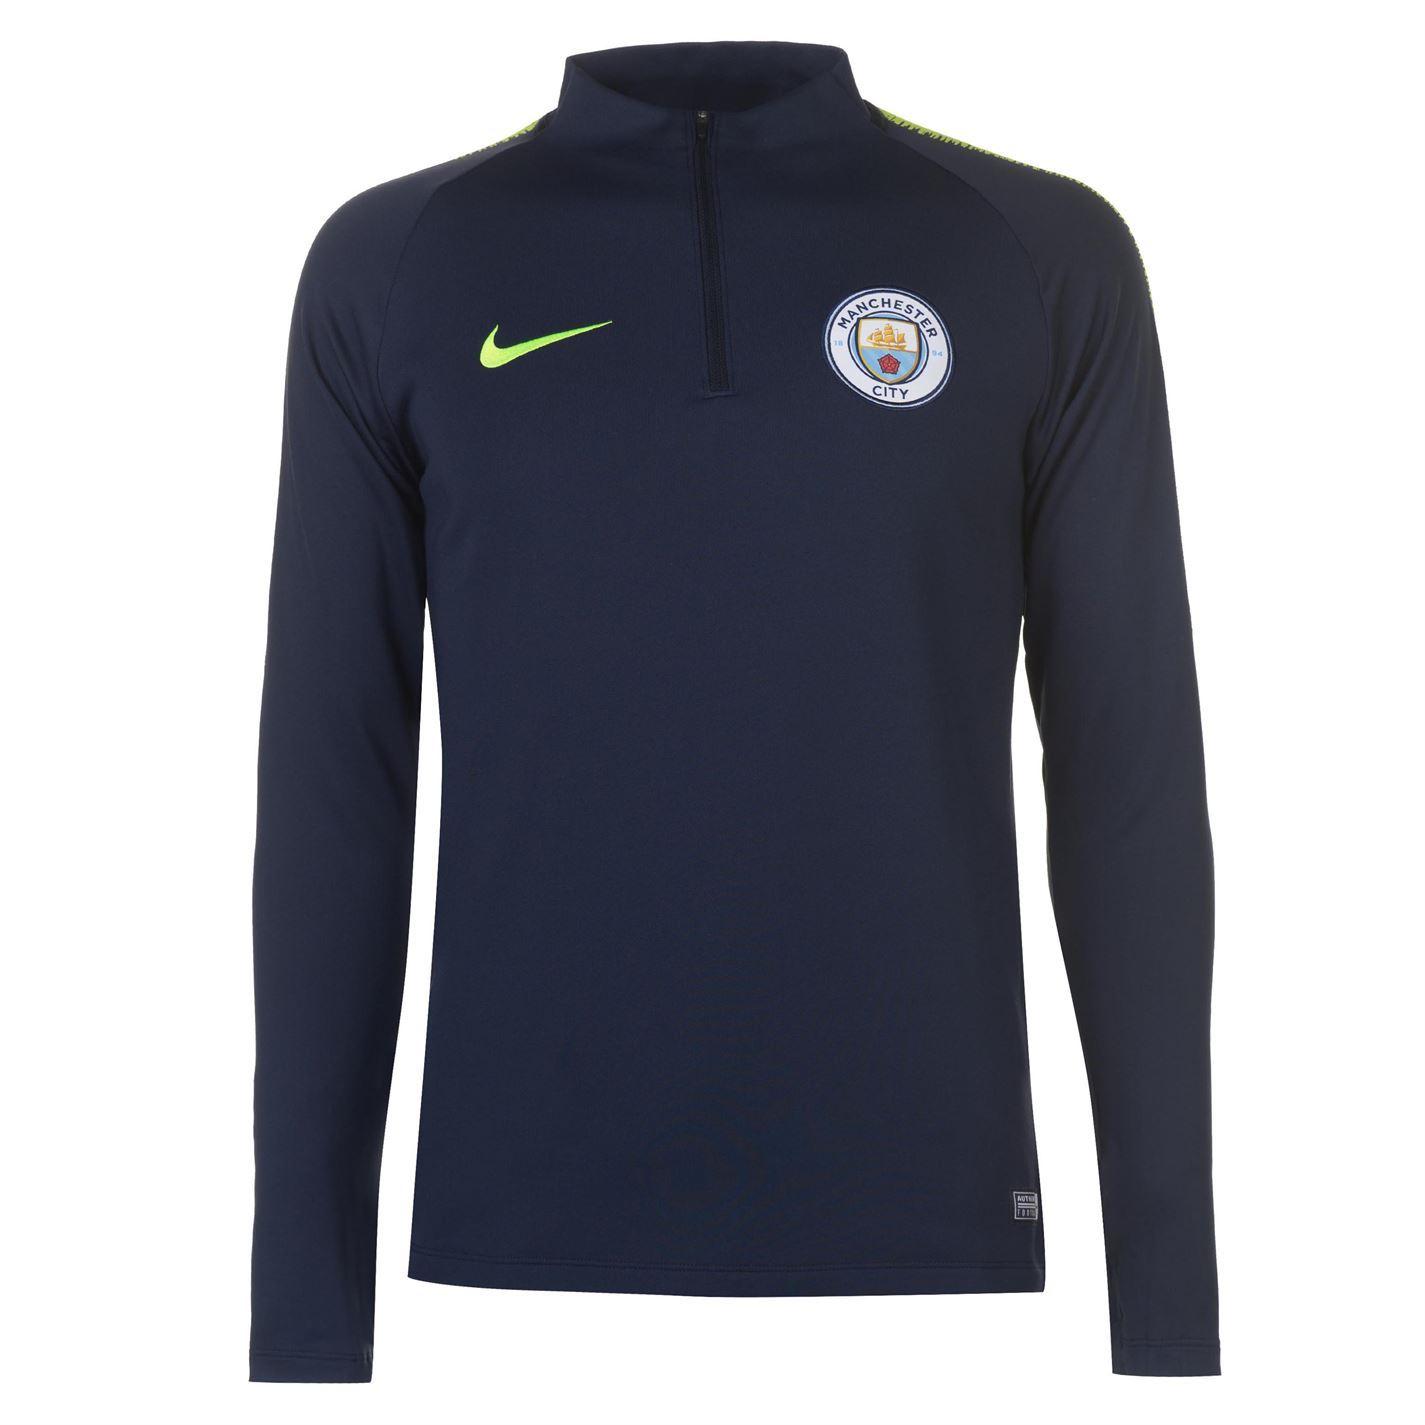 efa33c73b ... Nike Manchester City Squad Drill Top 2018 2019 Mens Football Soccer  Sweatshirt